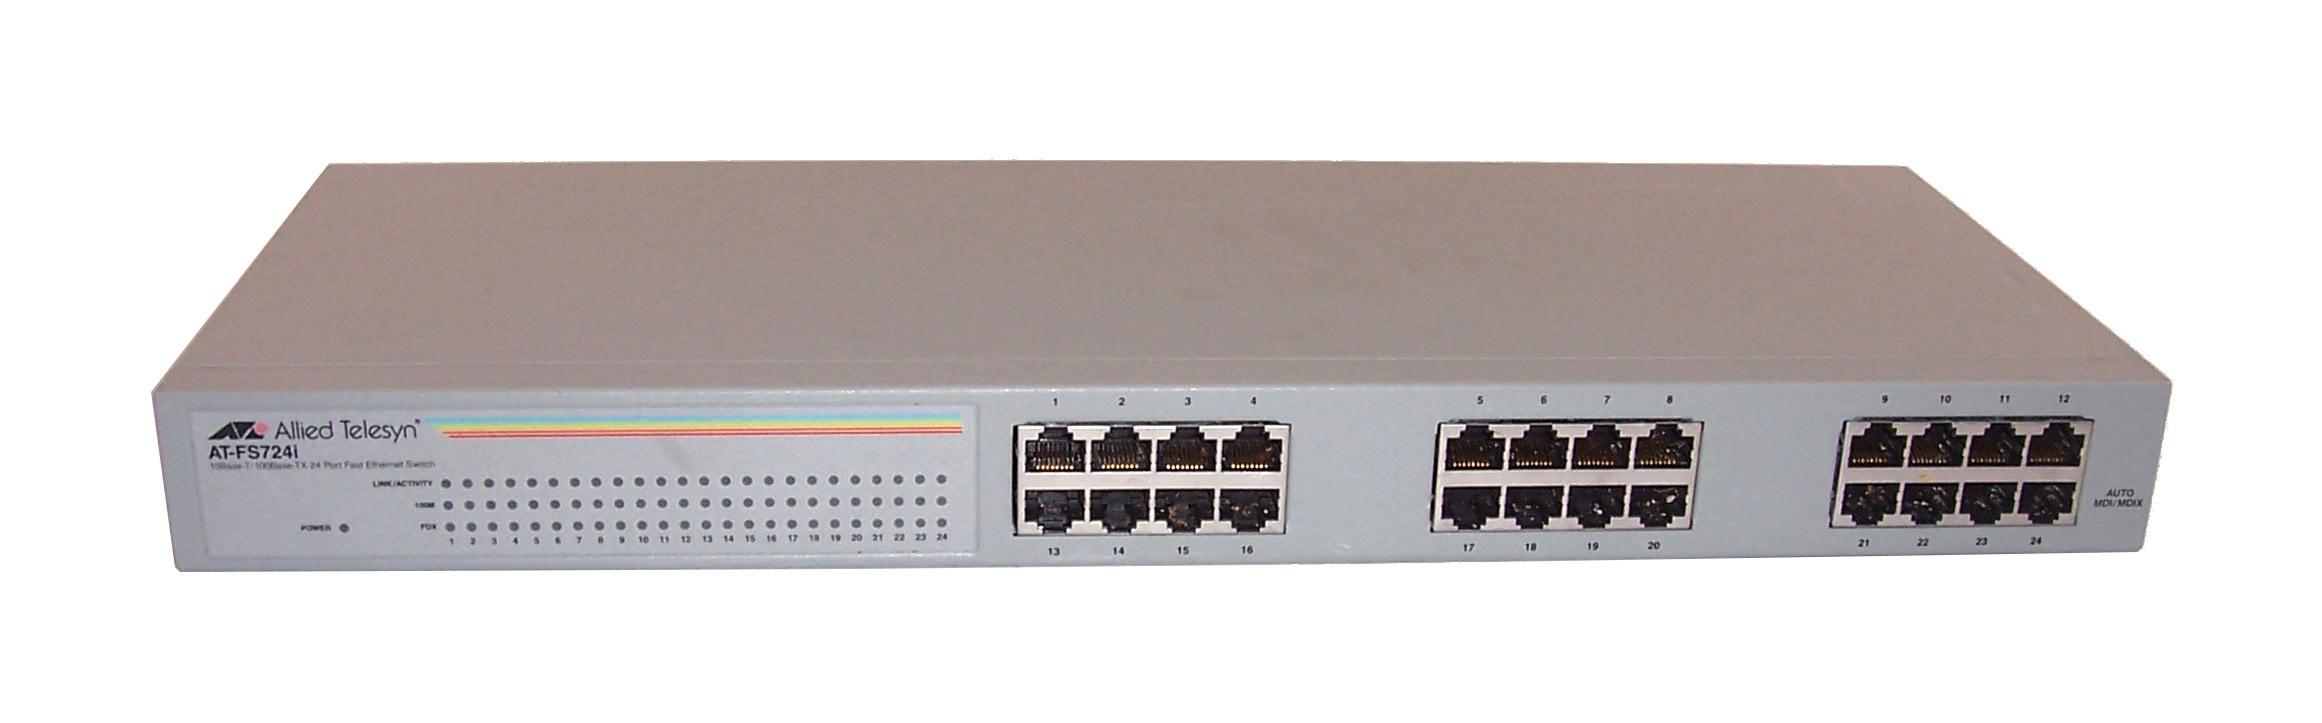 allied telesyn at fs724i 24 port fast ethernet switch no rack mount rh ebay co uk